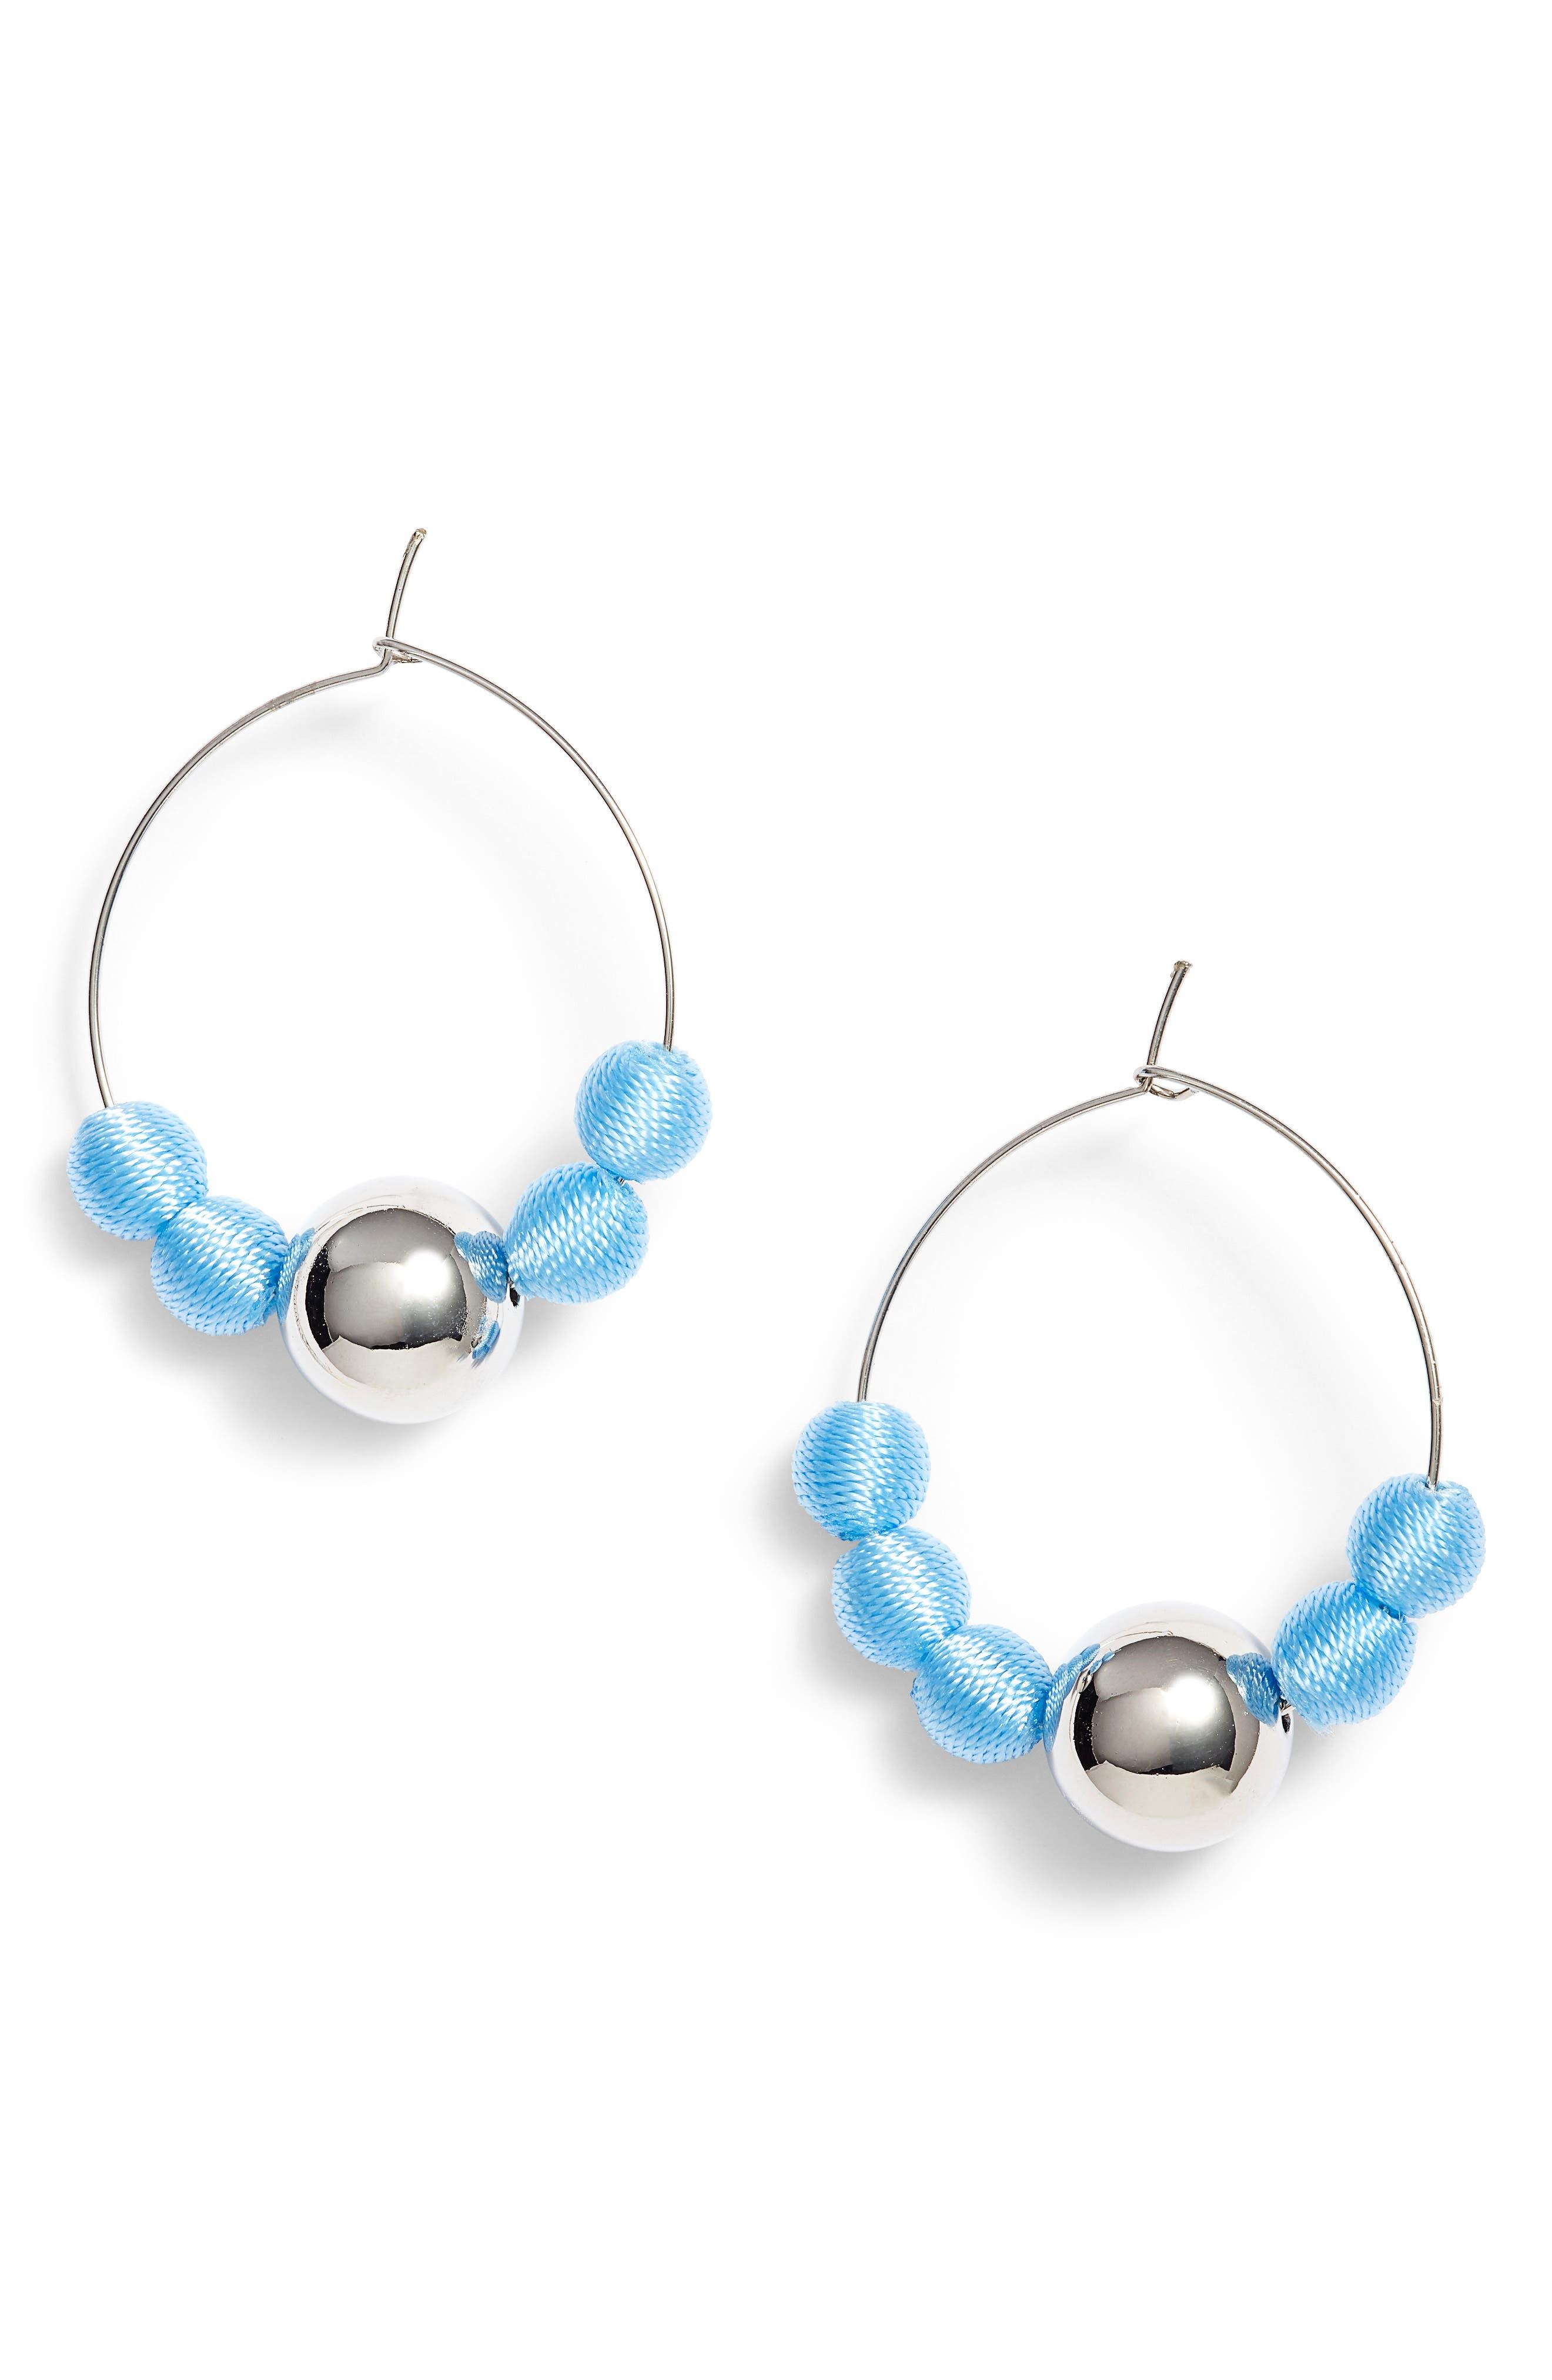 Threaded Sphere Hoop Earrings,                             Main thumbnail 1, color,                             Blue/ Silver